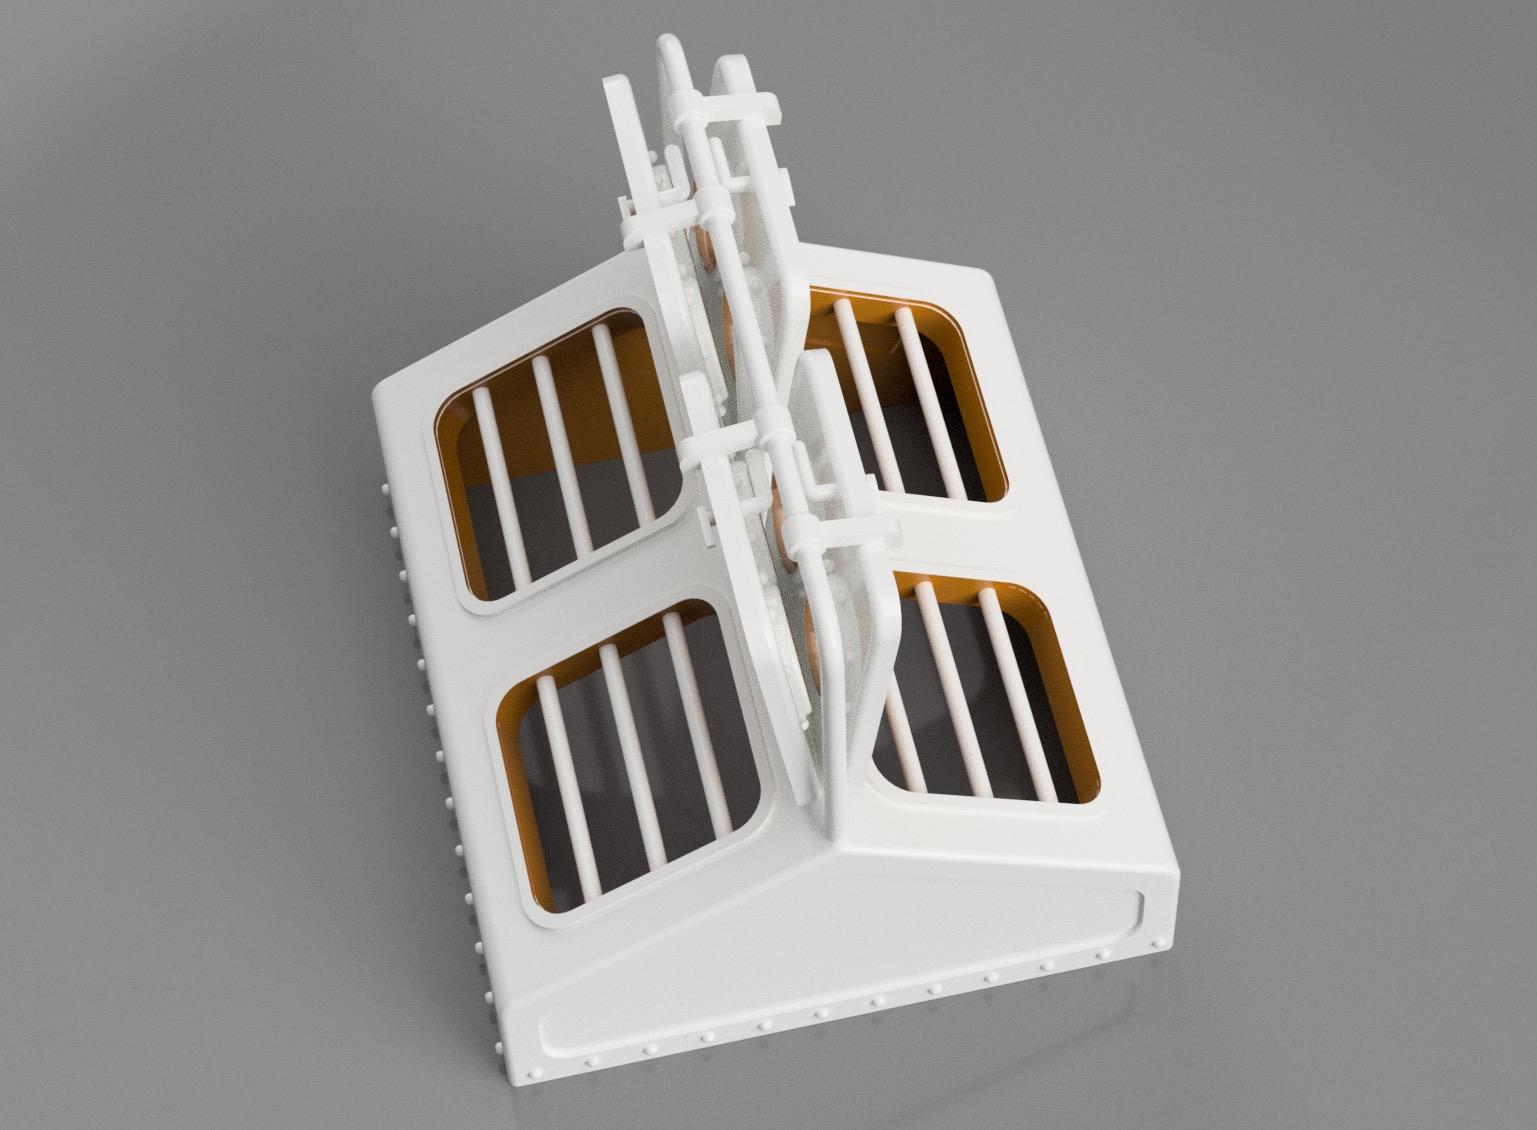 SS Nomadic (Modélisation 3D 1/200°) par Iceman29 - Page 8 Screen50